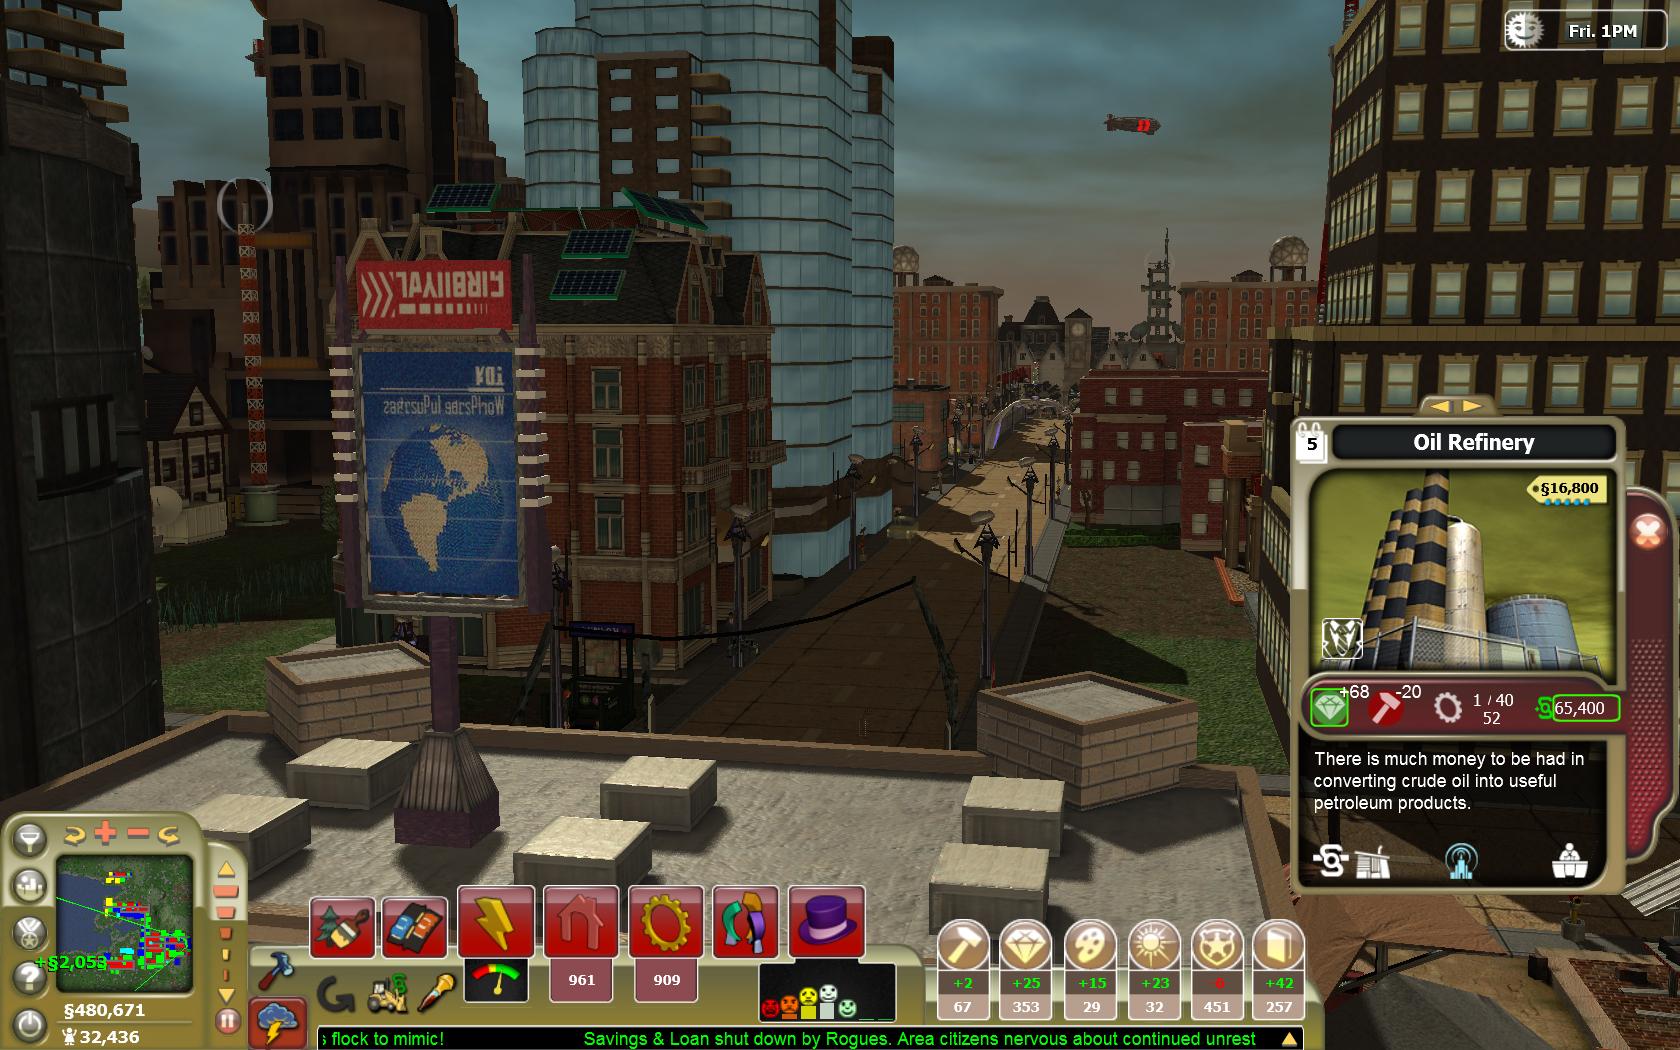 Simcity Societies Review (PC) - Biased Video Gamer Blog